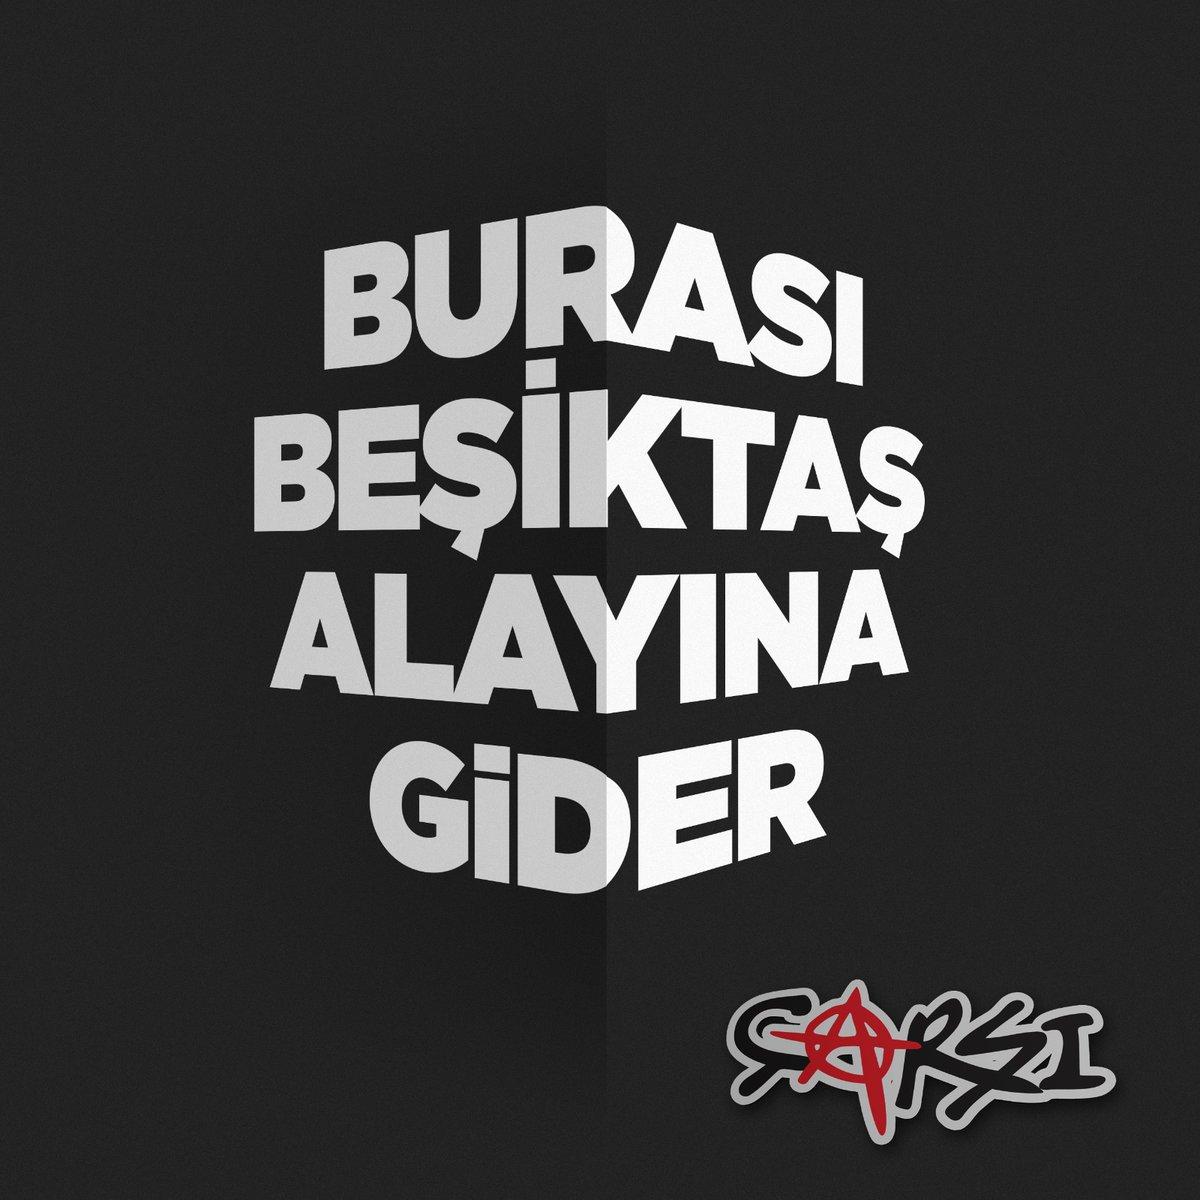 Uğraşma bizimle Hello Kitty @Fenerbahce  #Beşiktaş